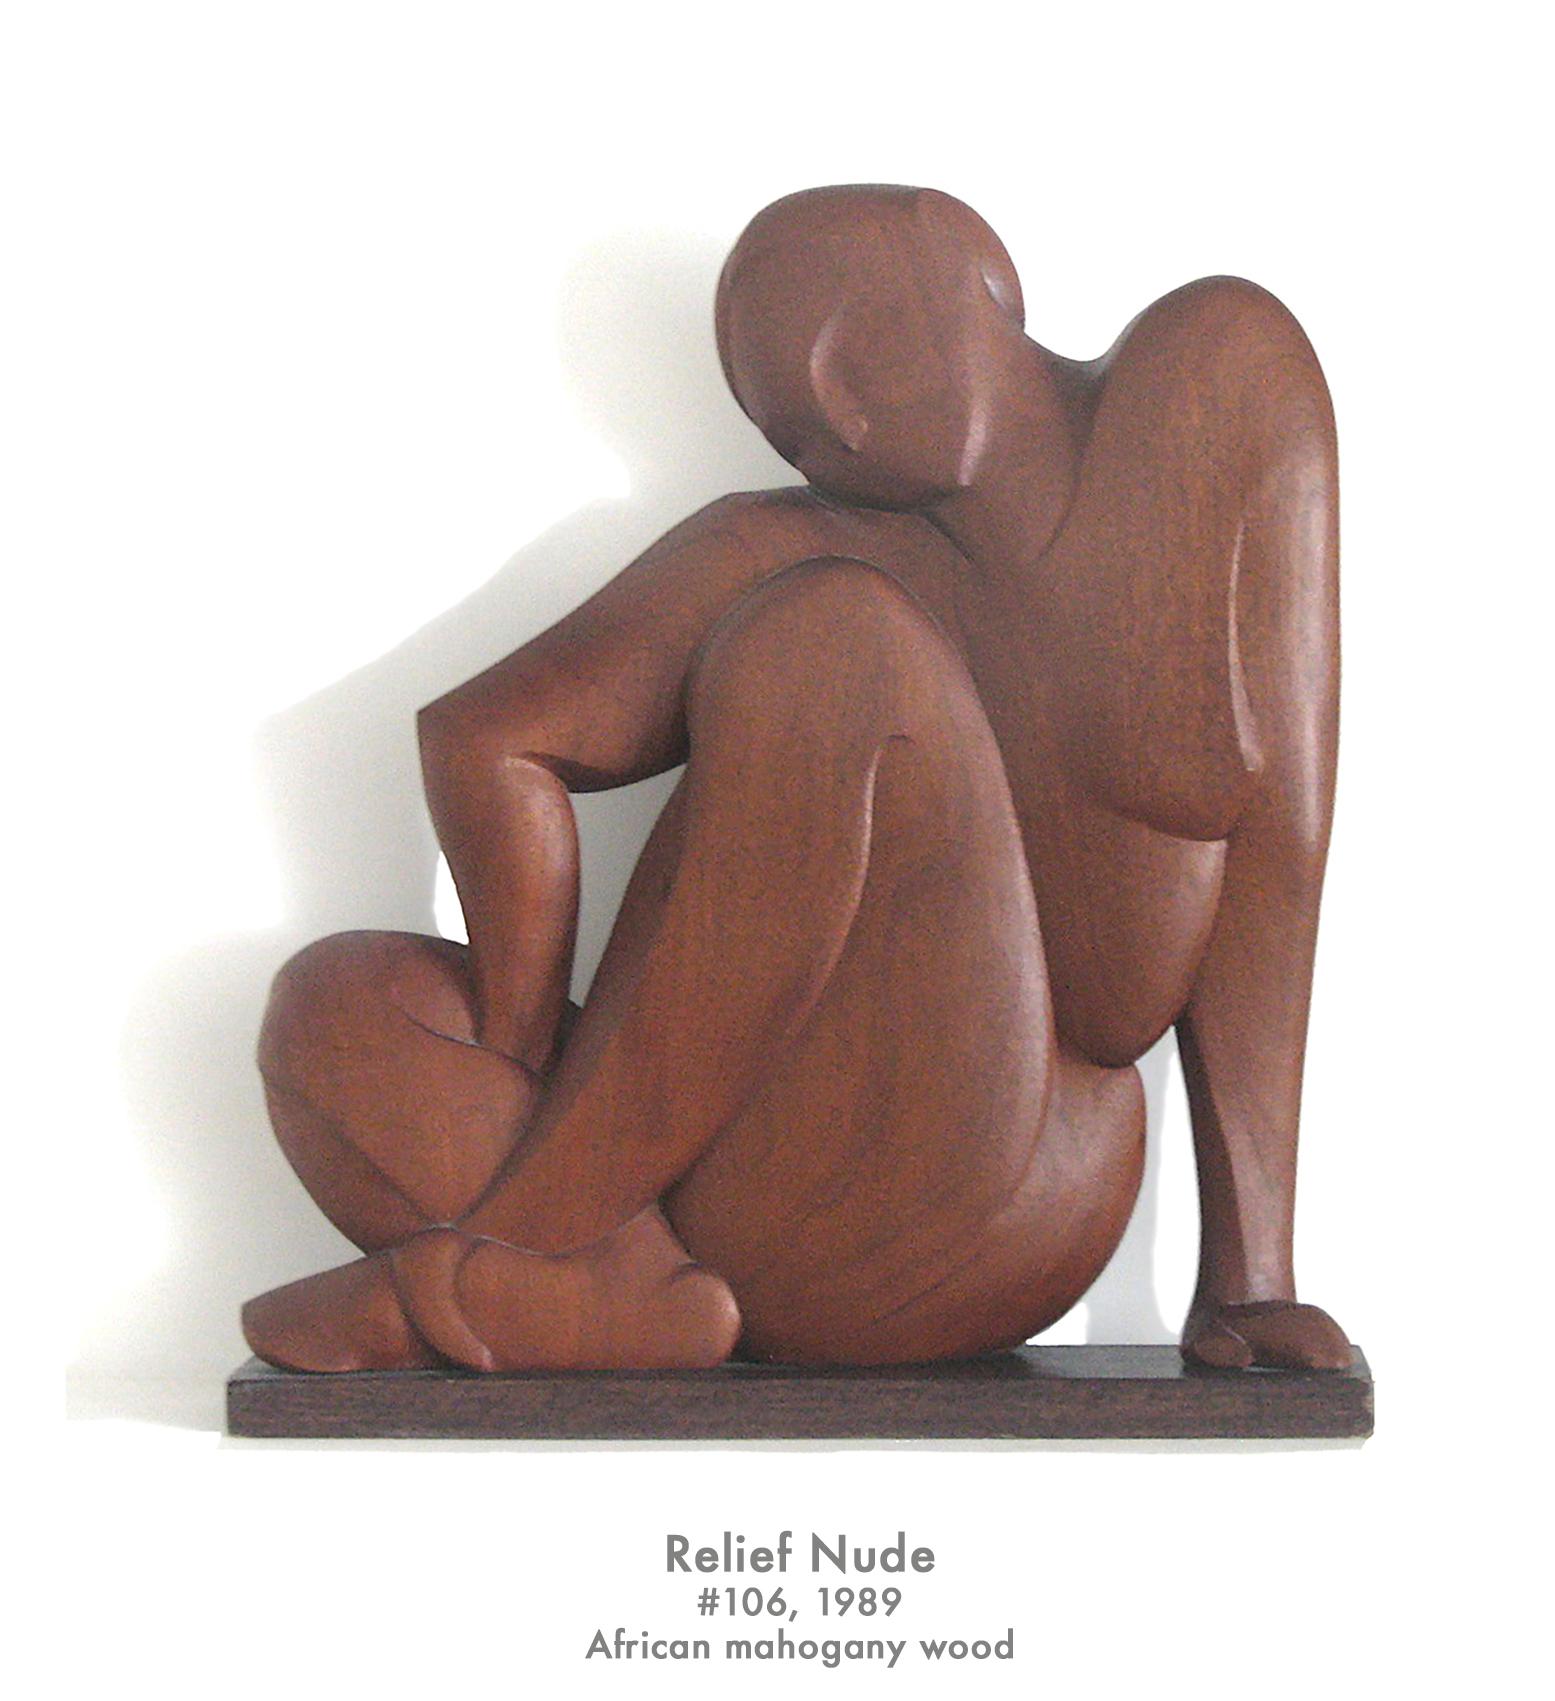 106 Relief Nude copy.jpg